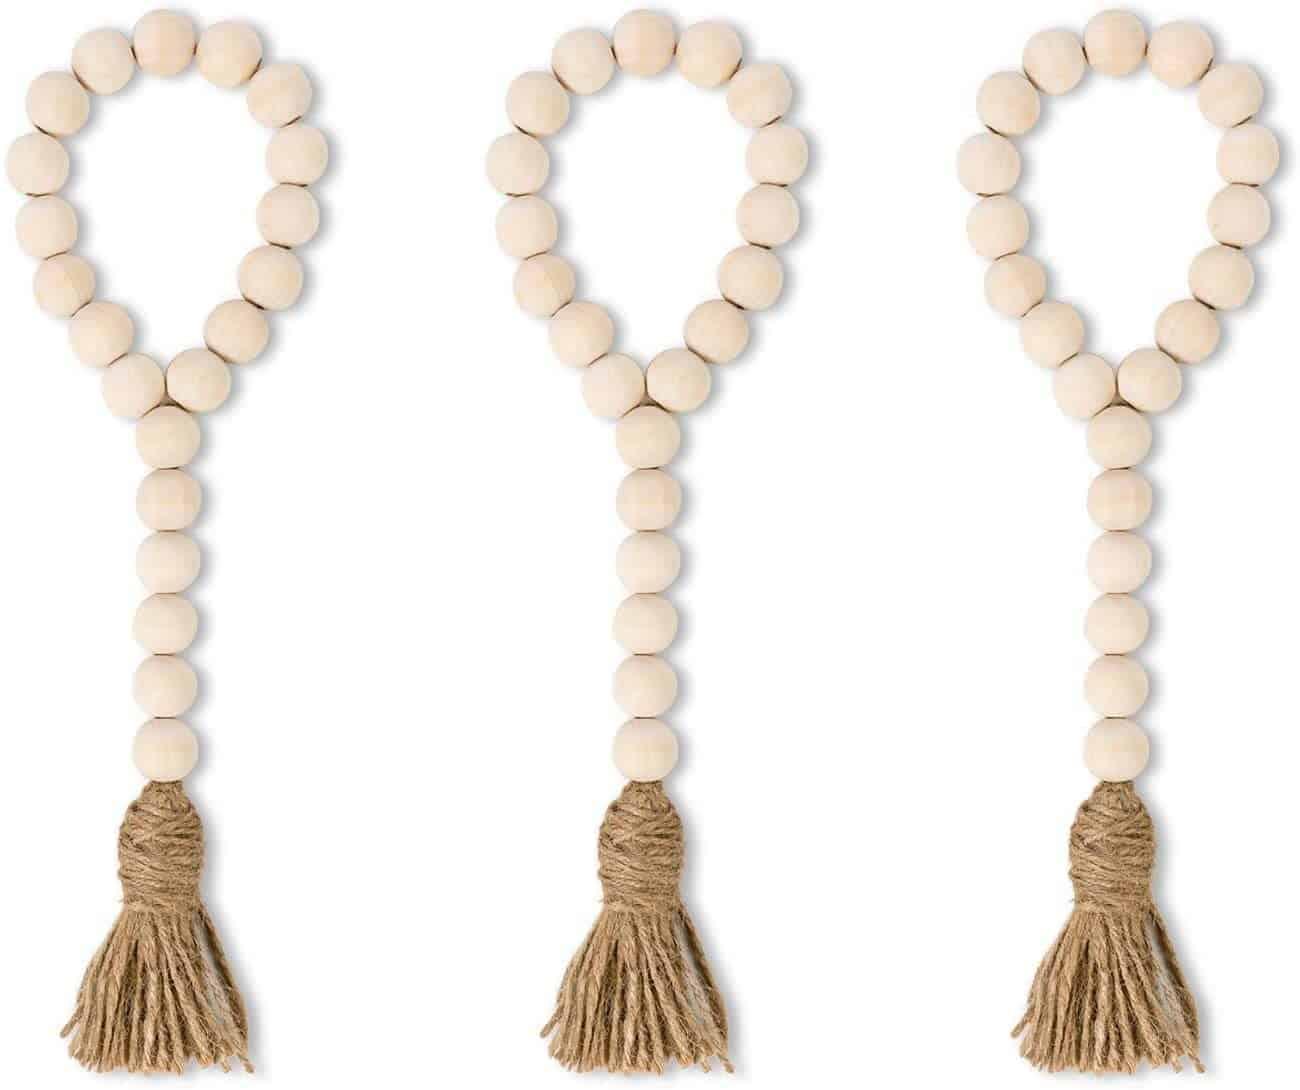 3-Piece-Wood-Bead-Garland-with-Tassels